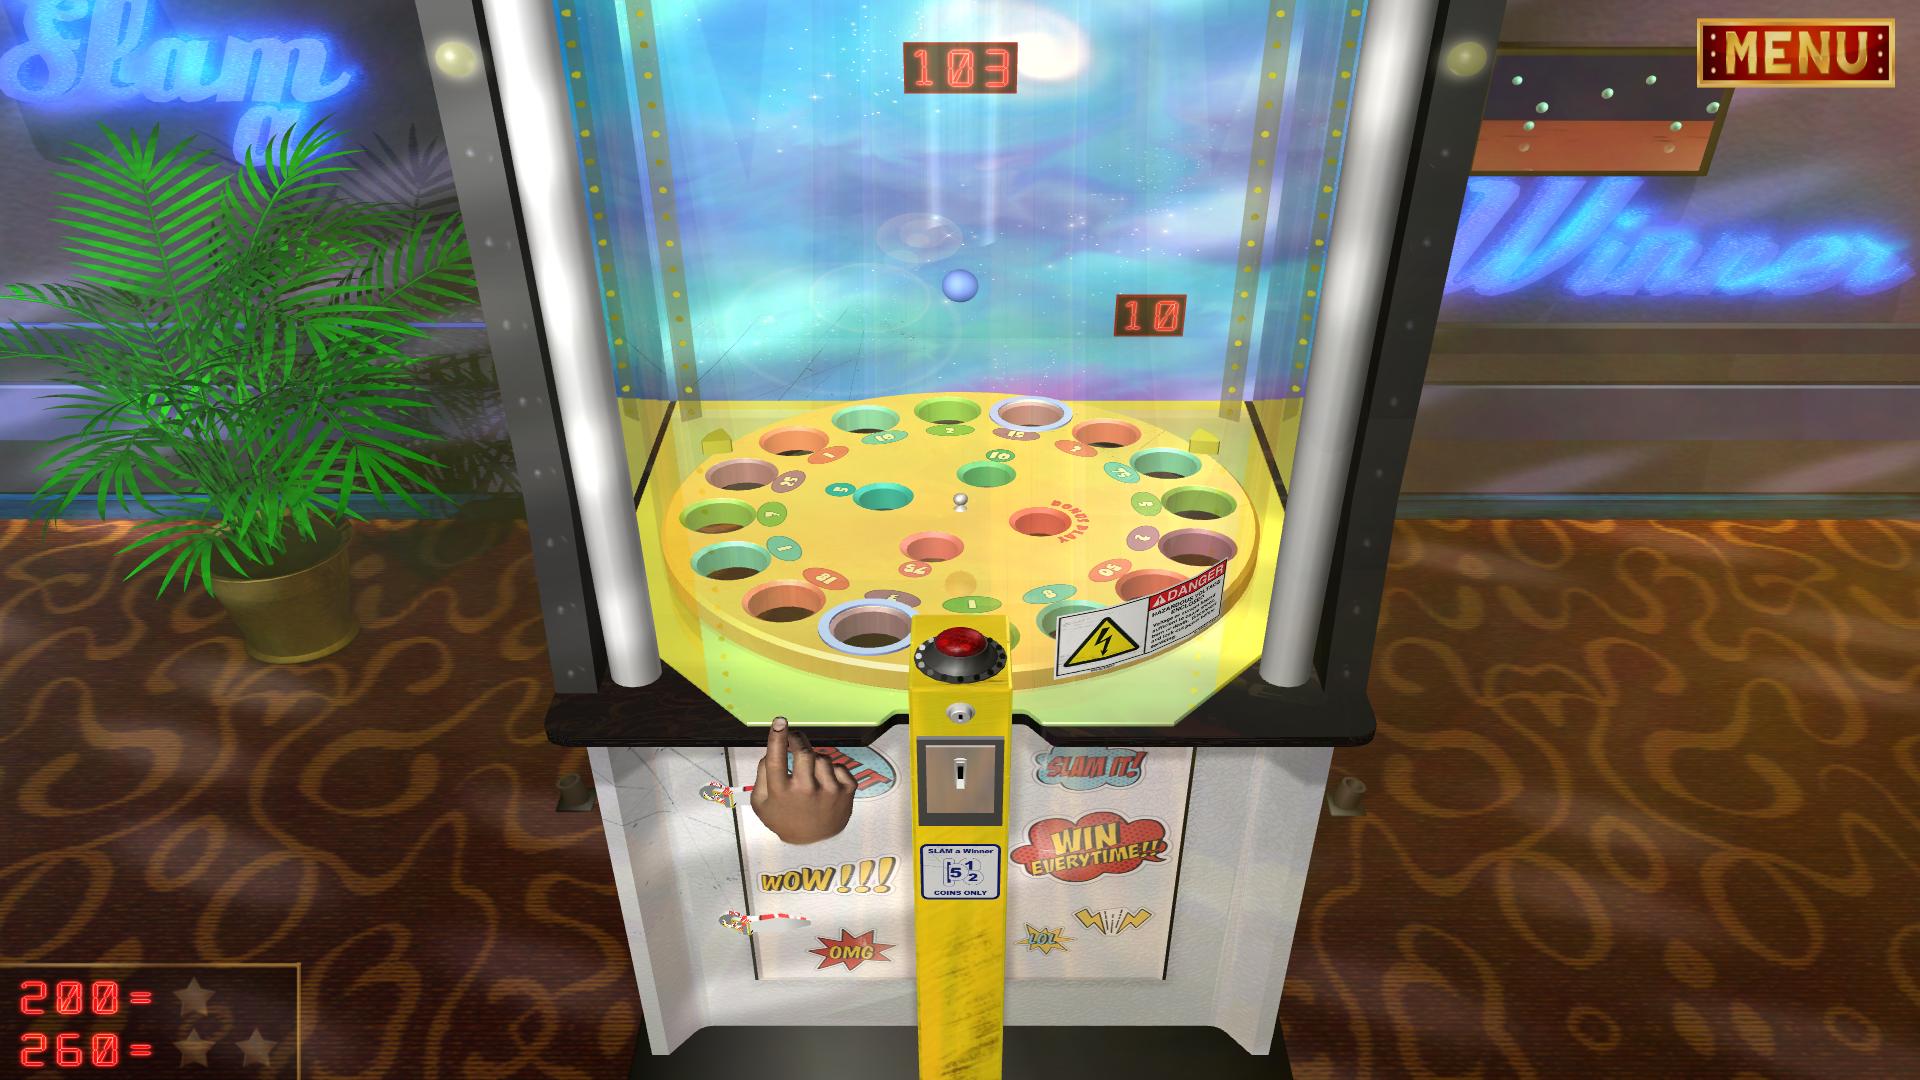 Equestria Gaming Arcade